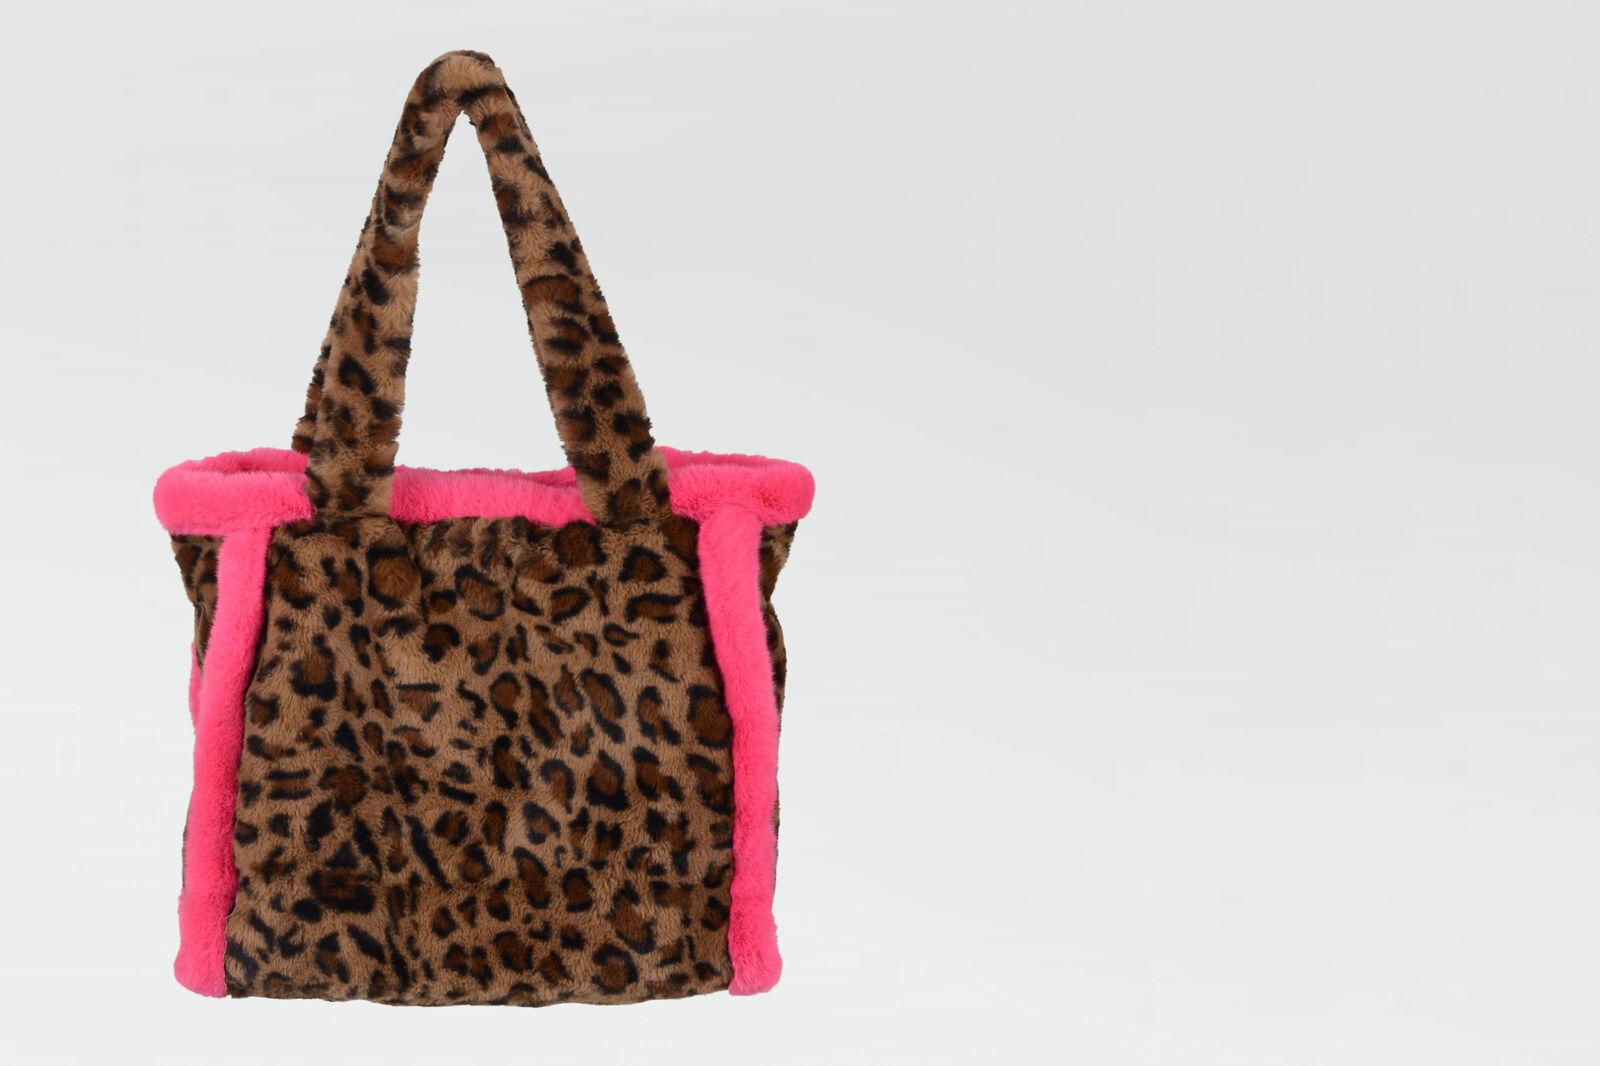 Hally Shopper by Nicolette van Dam